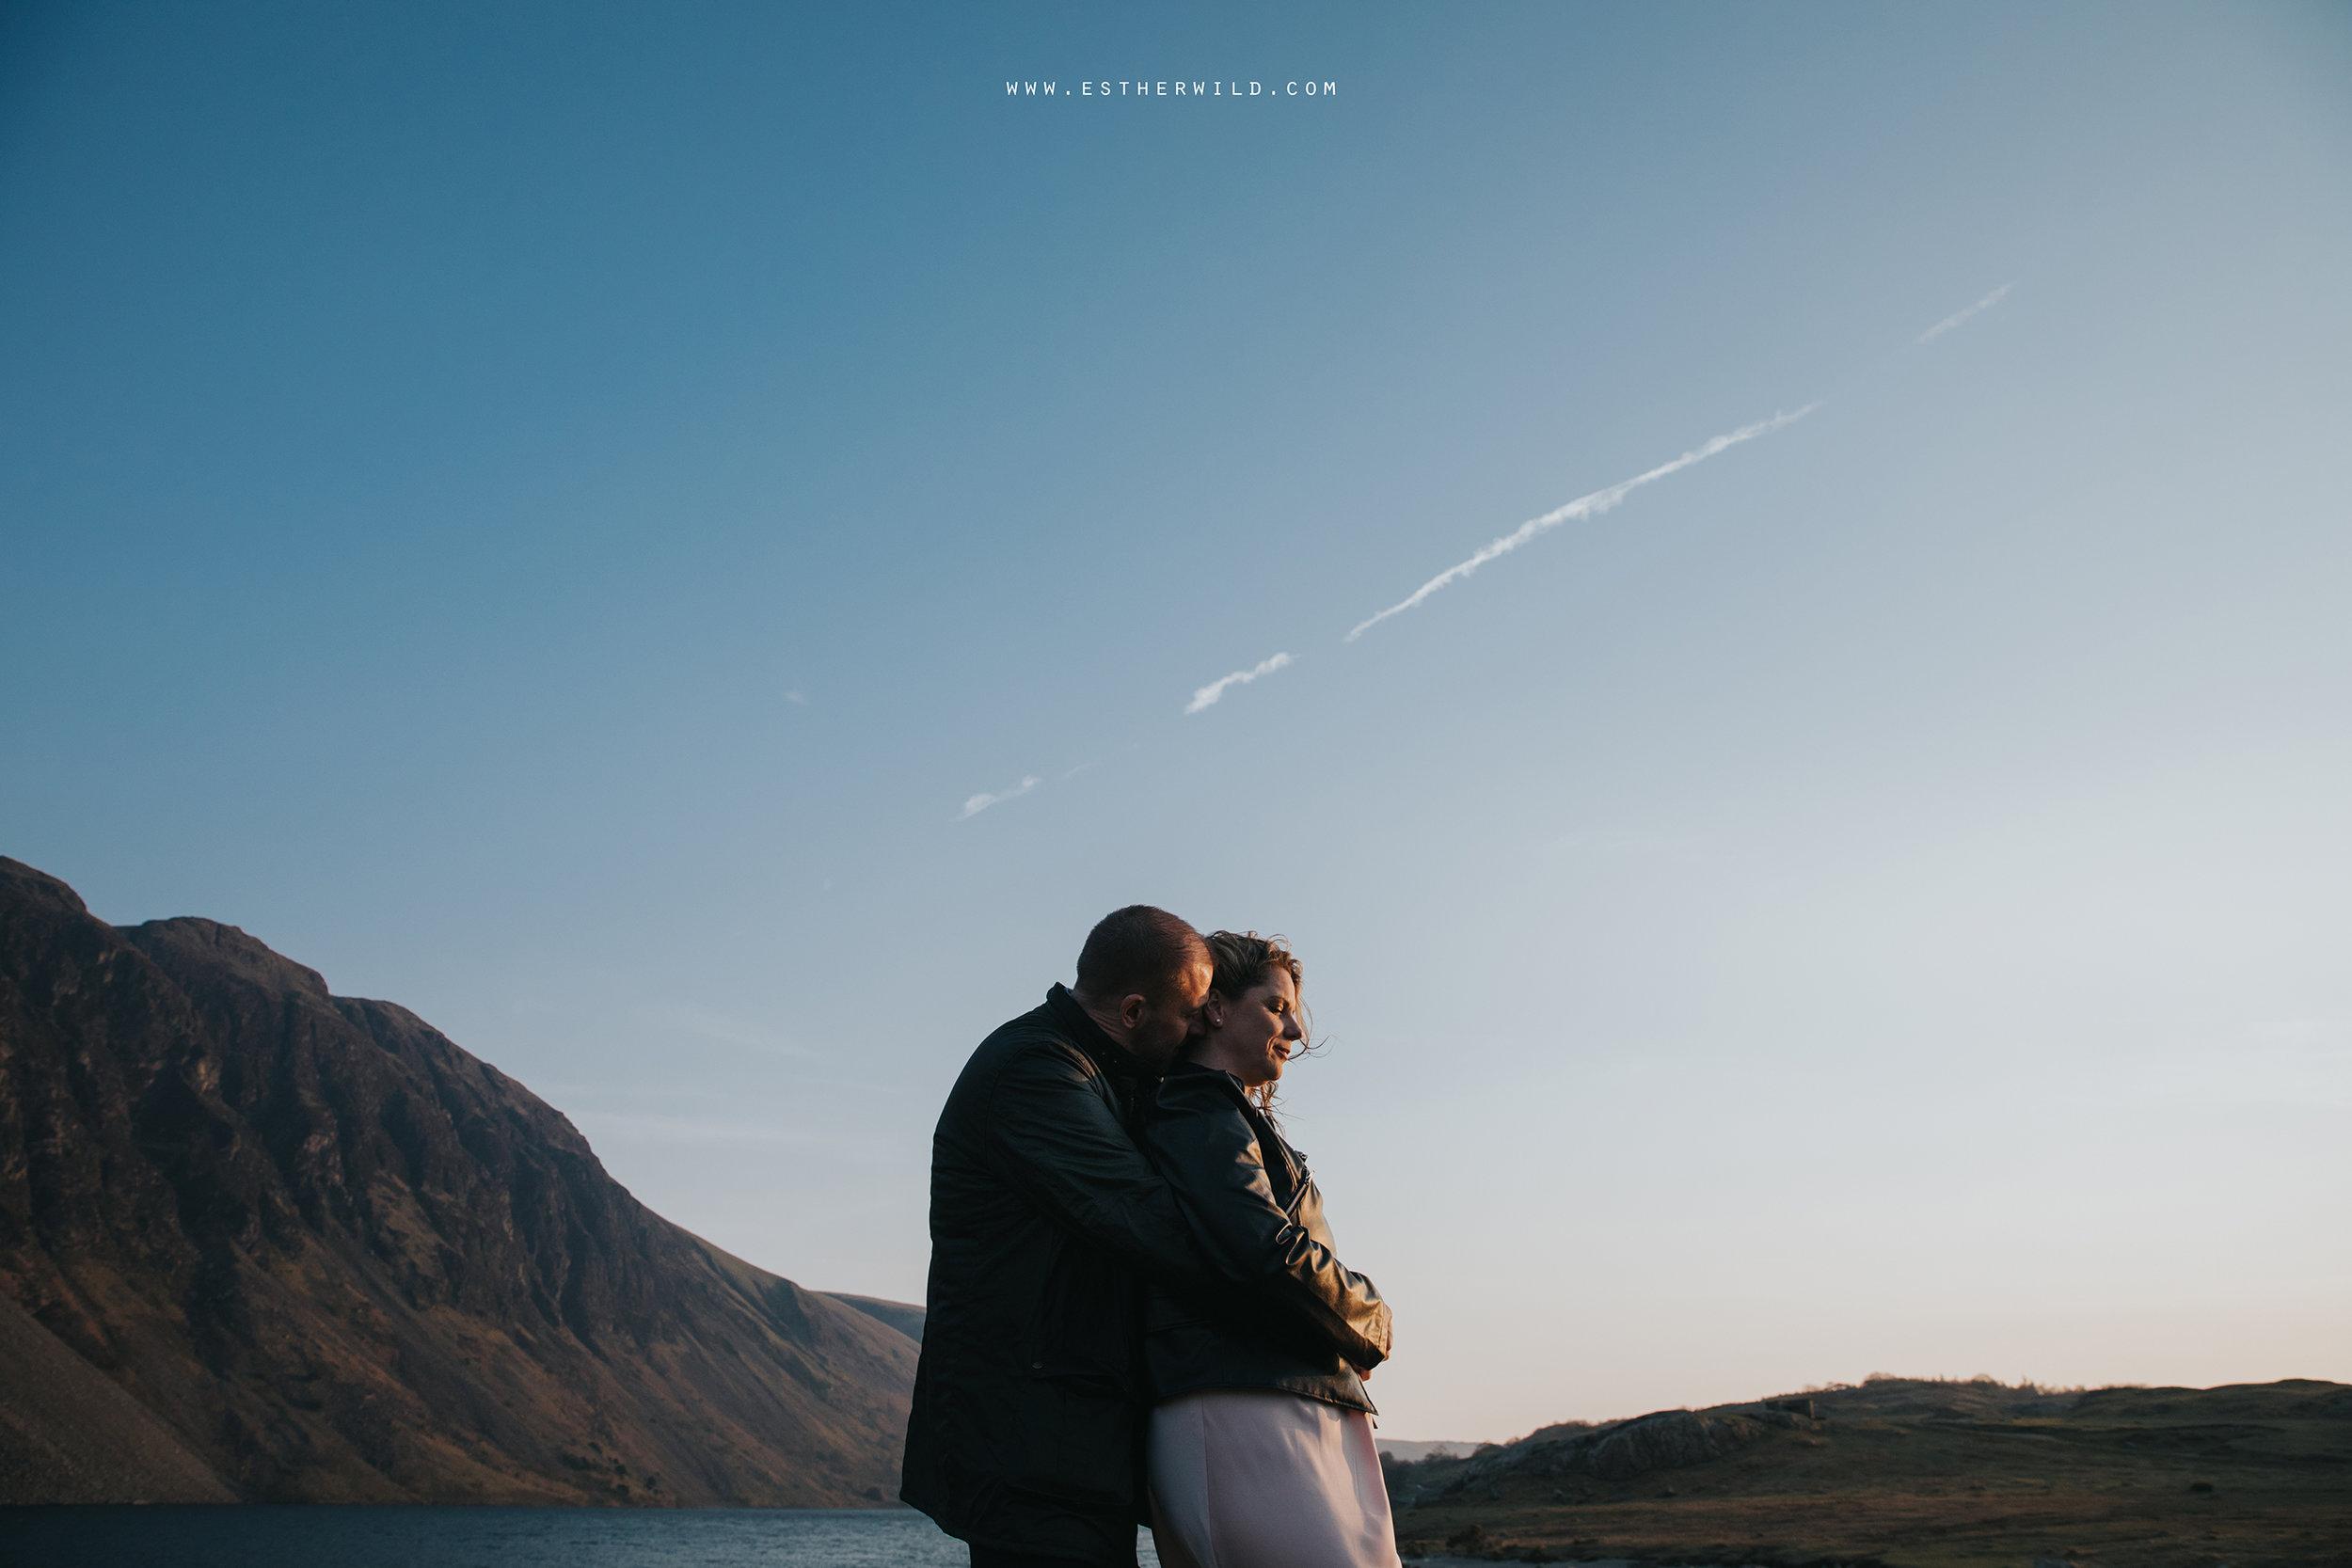 Cumbria_Lake_District_Wasdale_Wedding_Photographer_Destination_Engagement_Anniversary_Esther_Wild_IMG_4721.jpg